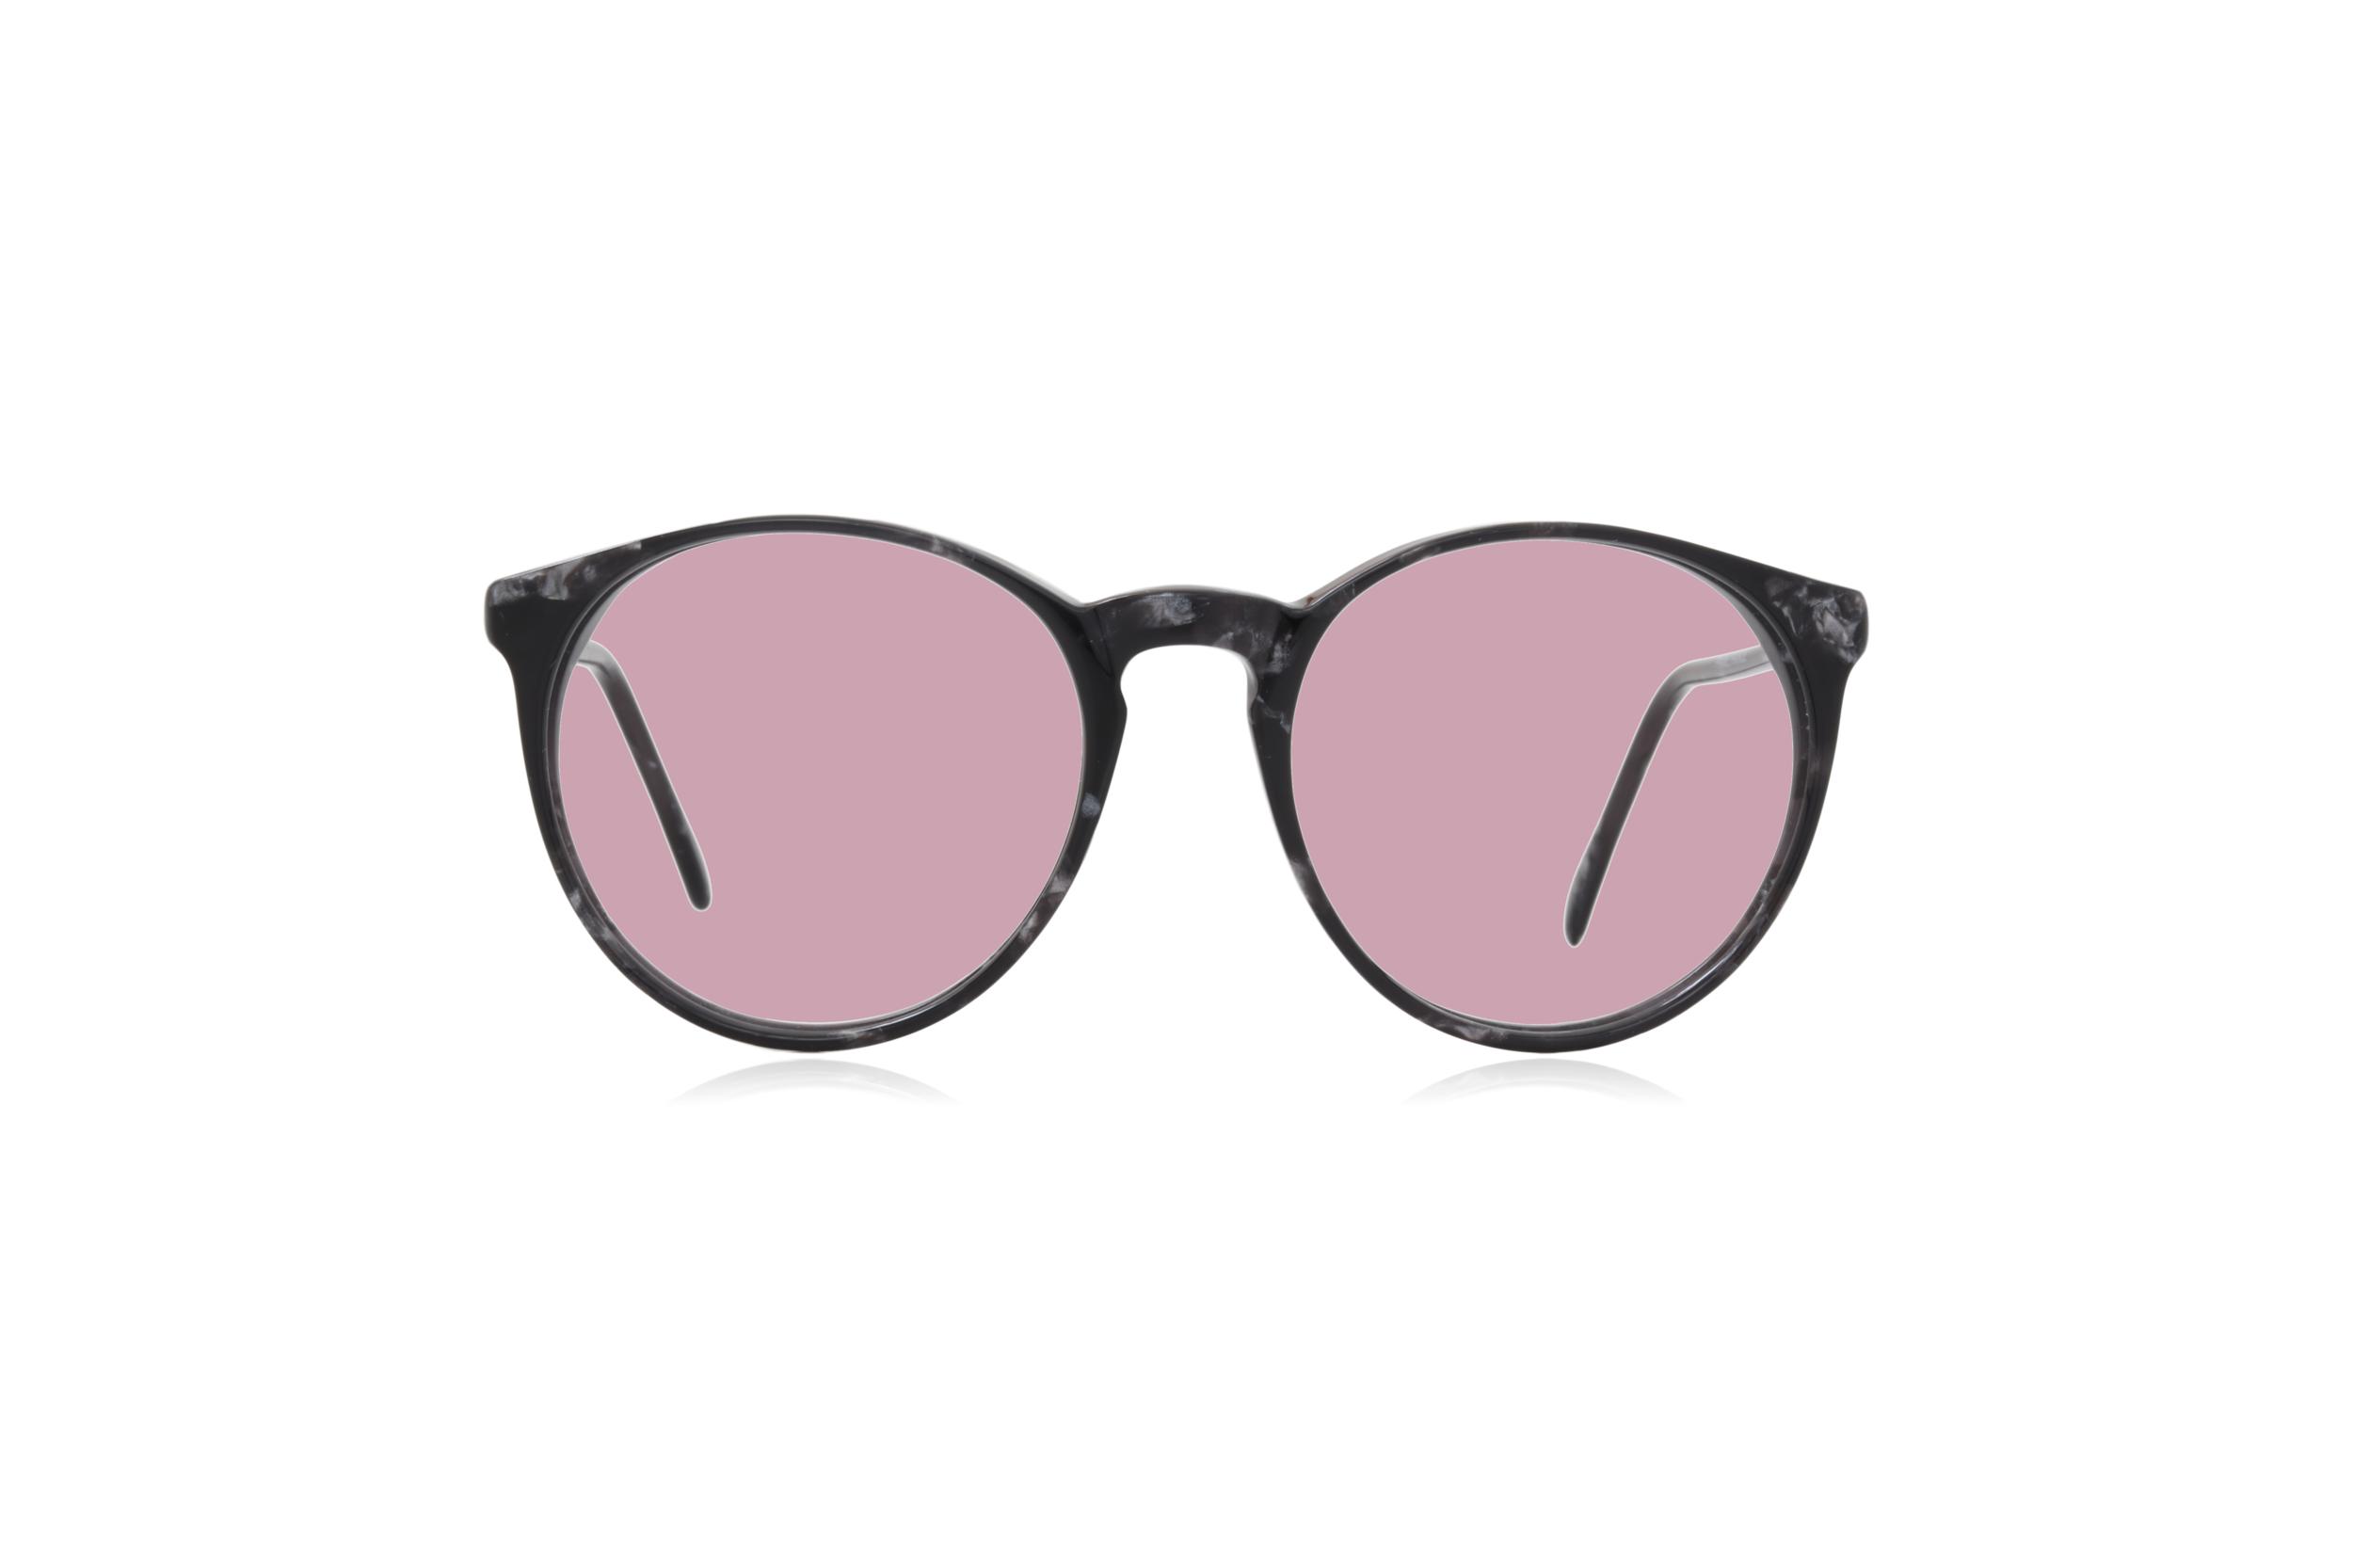 Peep Eyewear, Vintage Glasses, Morel 2730, Round, 80s, Pink.png